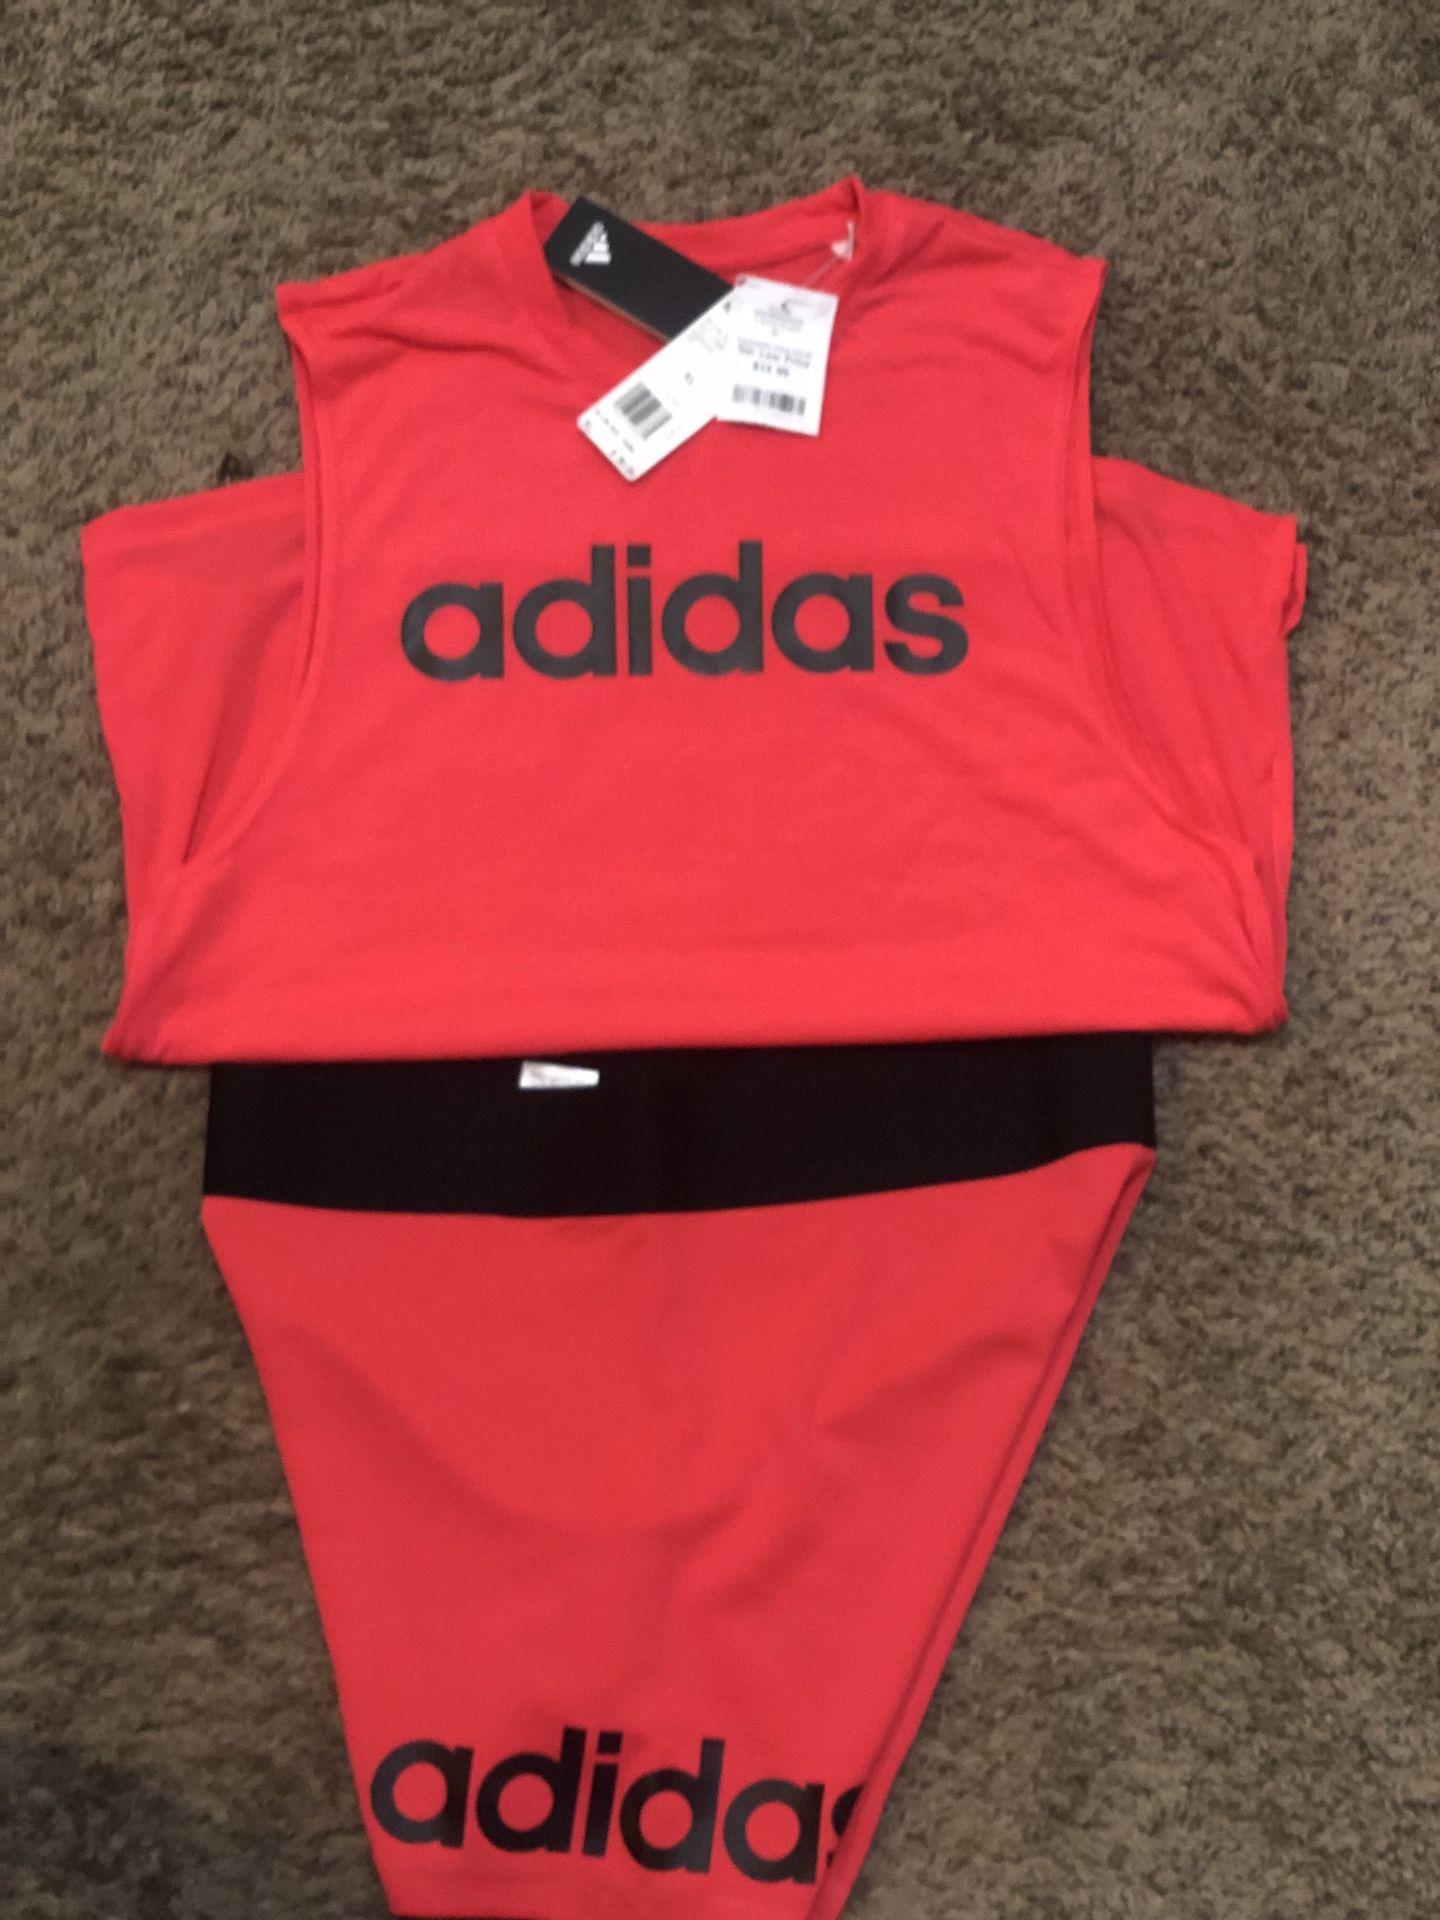 Adidas women's xl